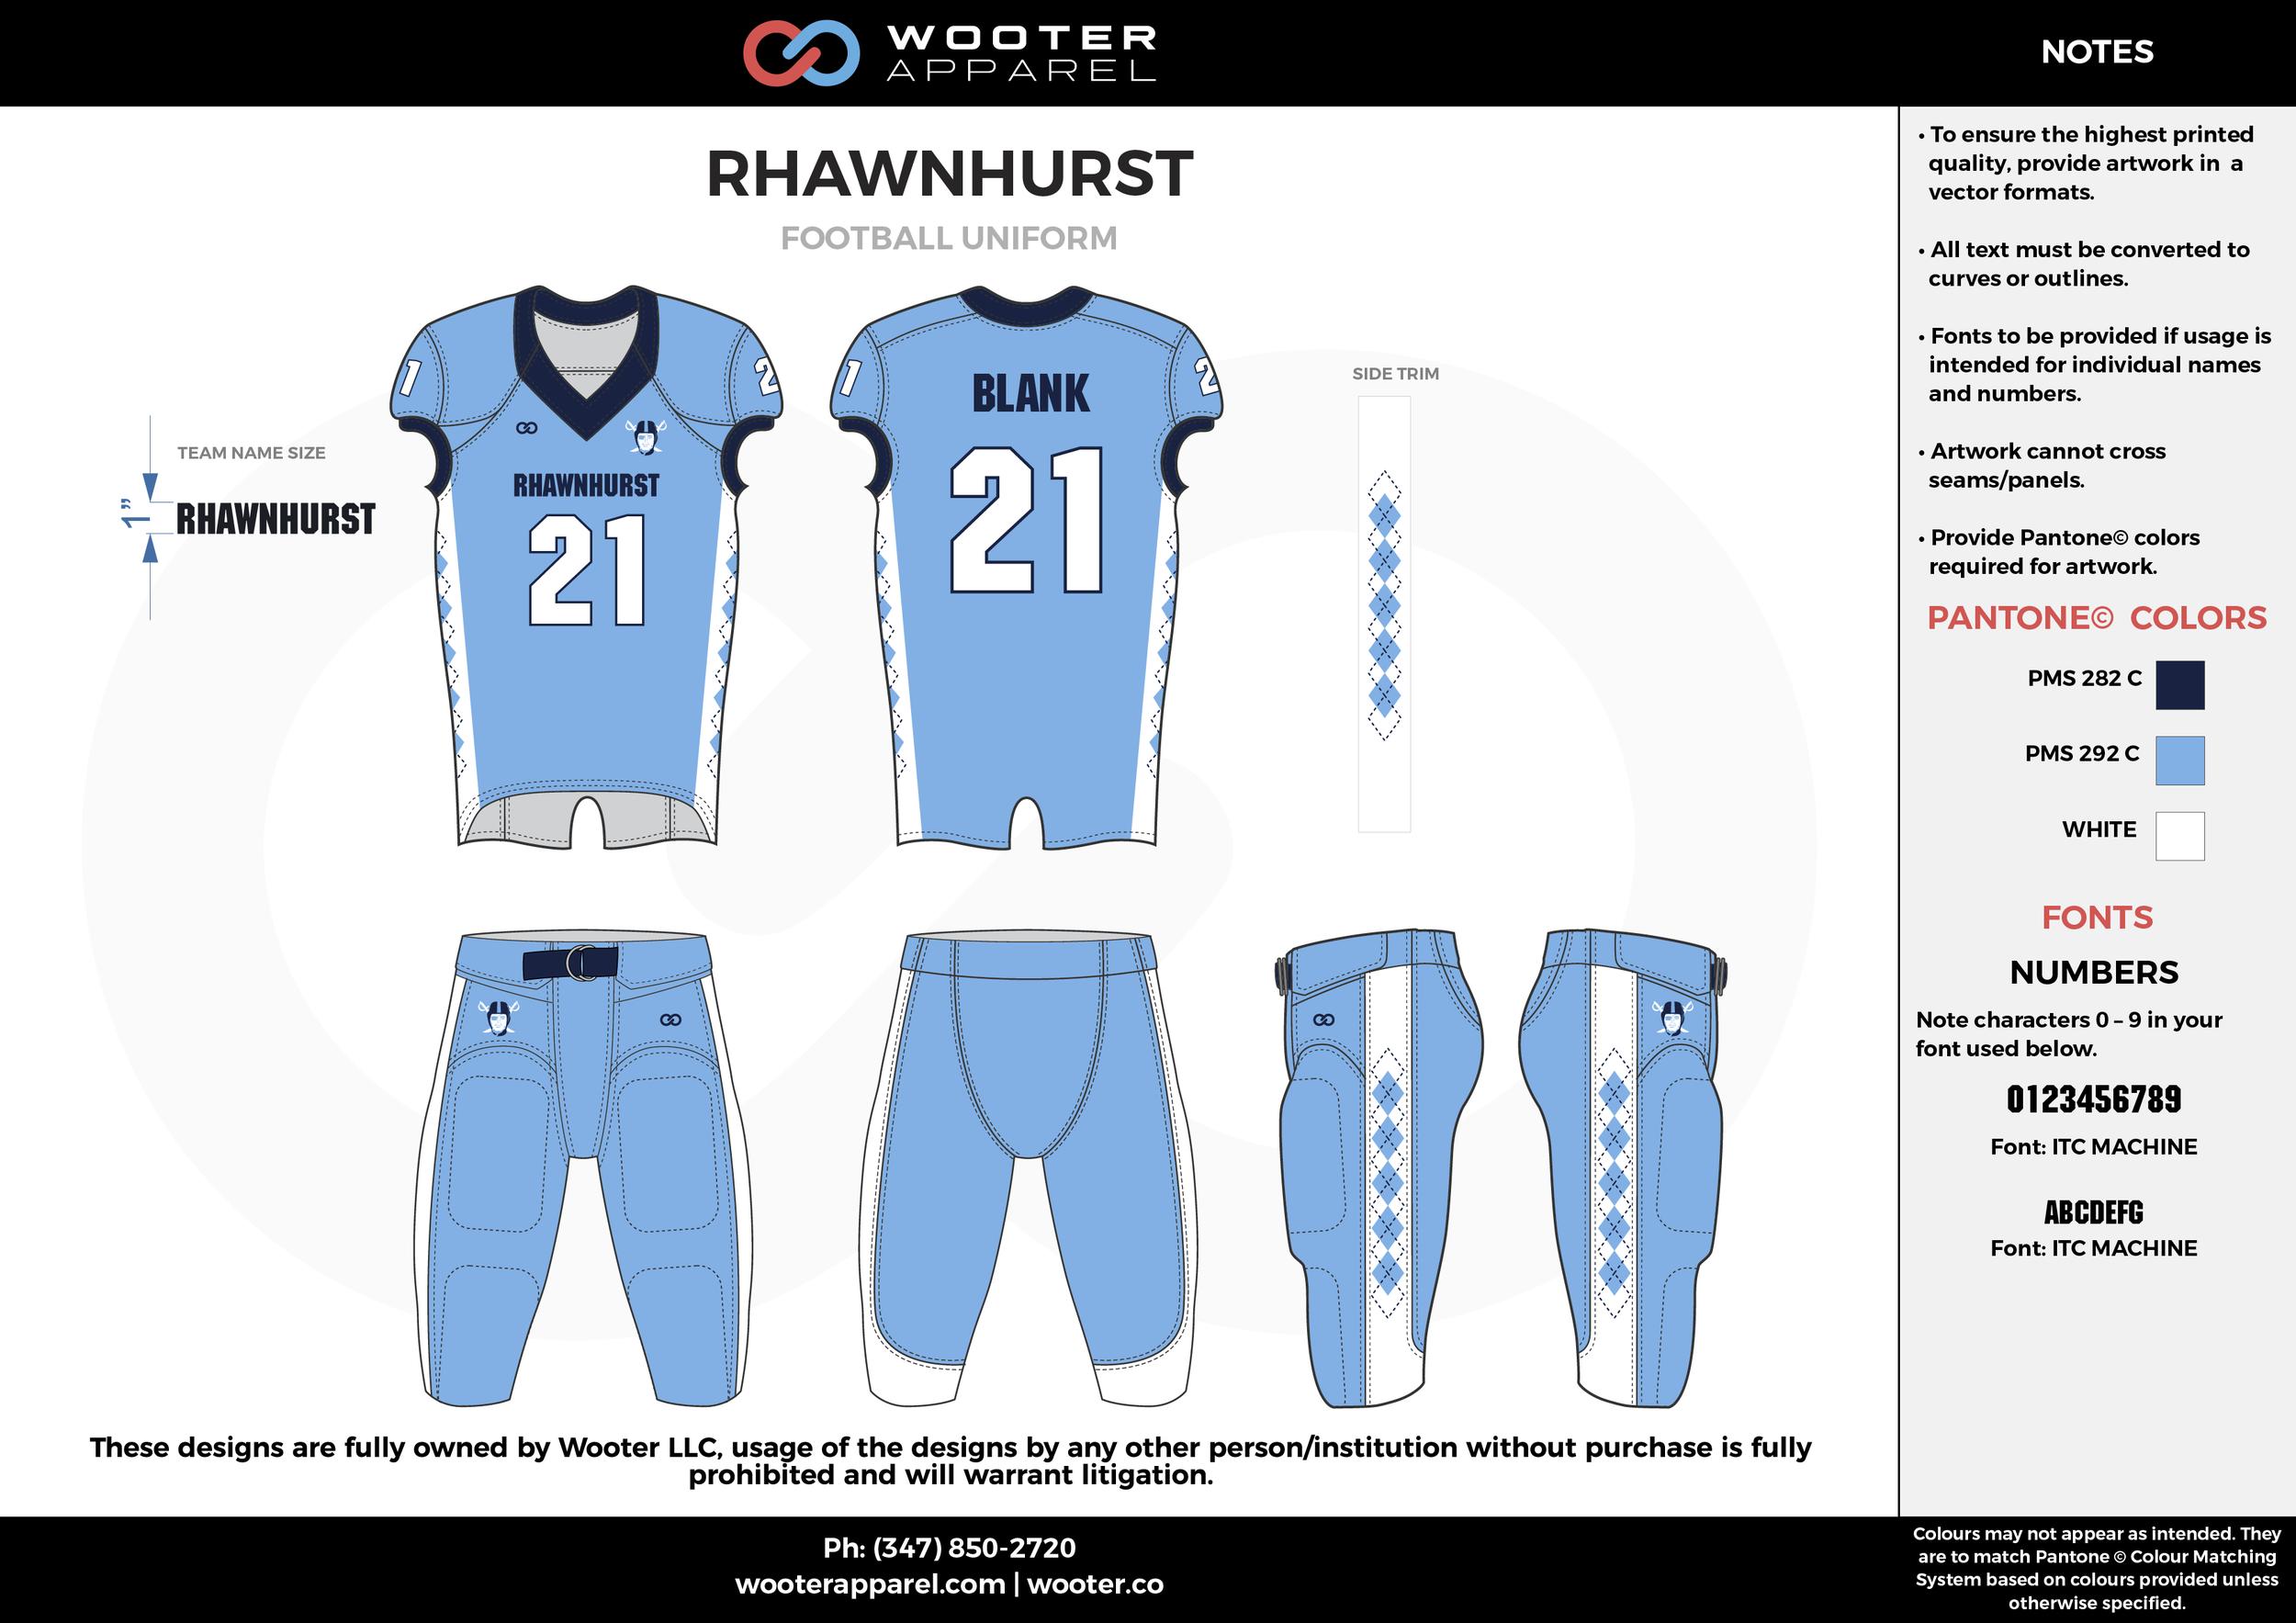 RHAWNHURST blue black white football uniforms jerseys pants